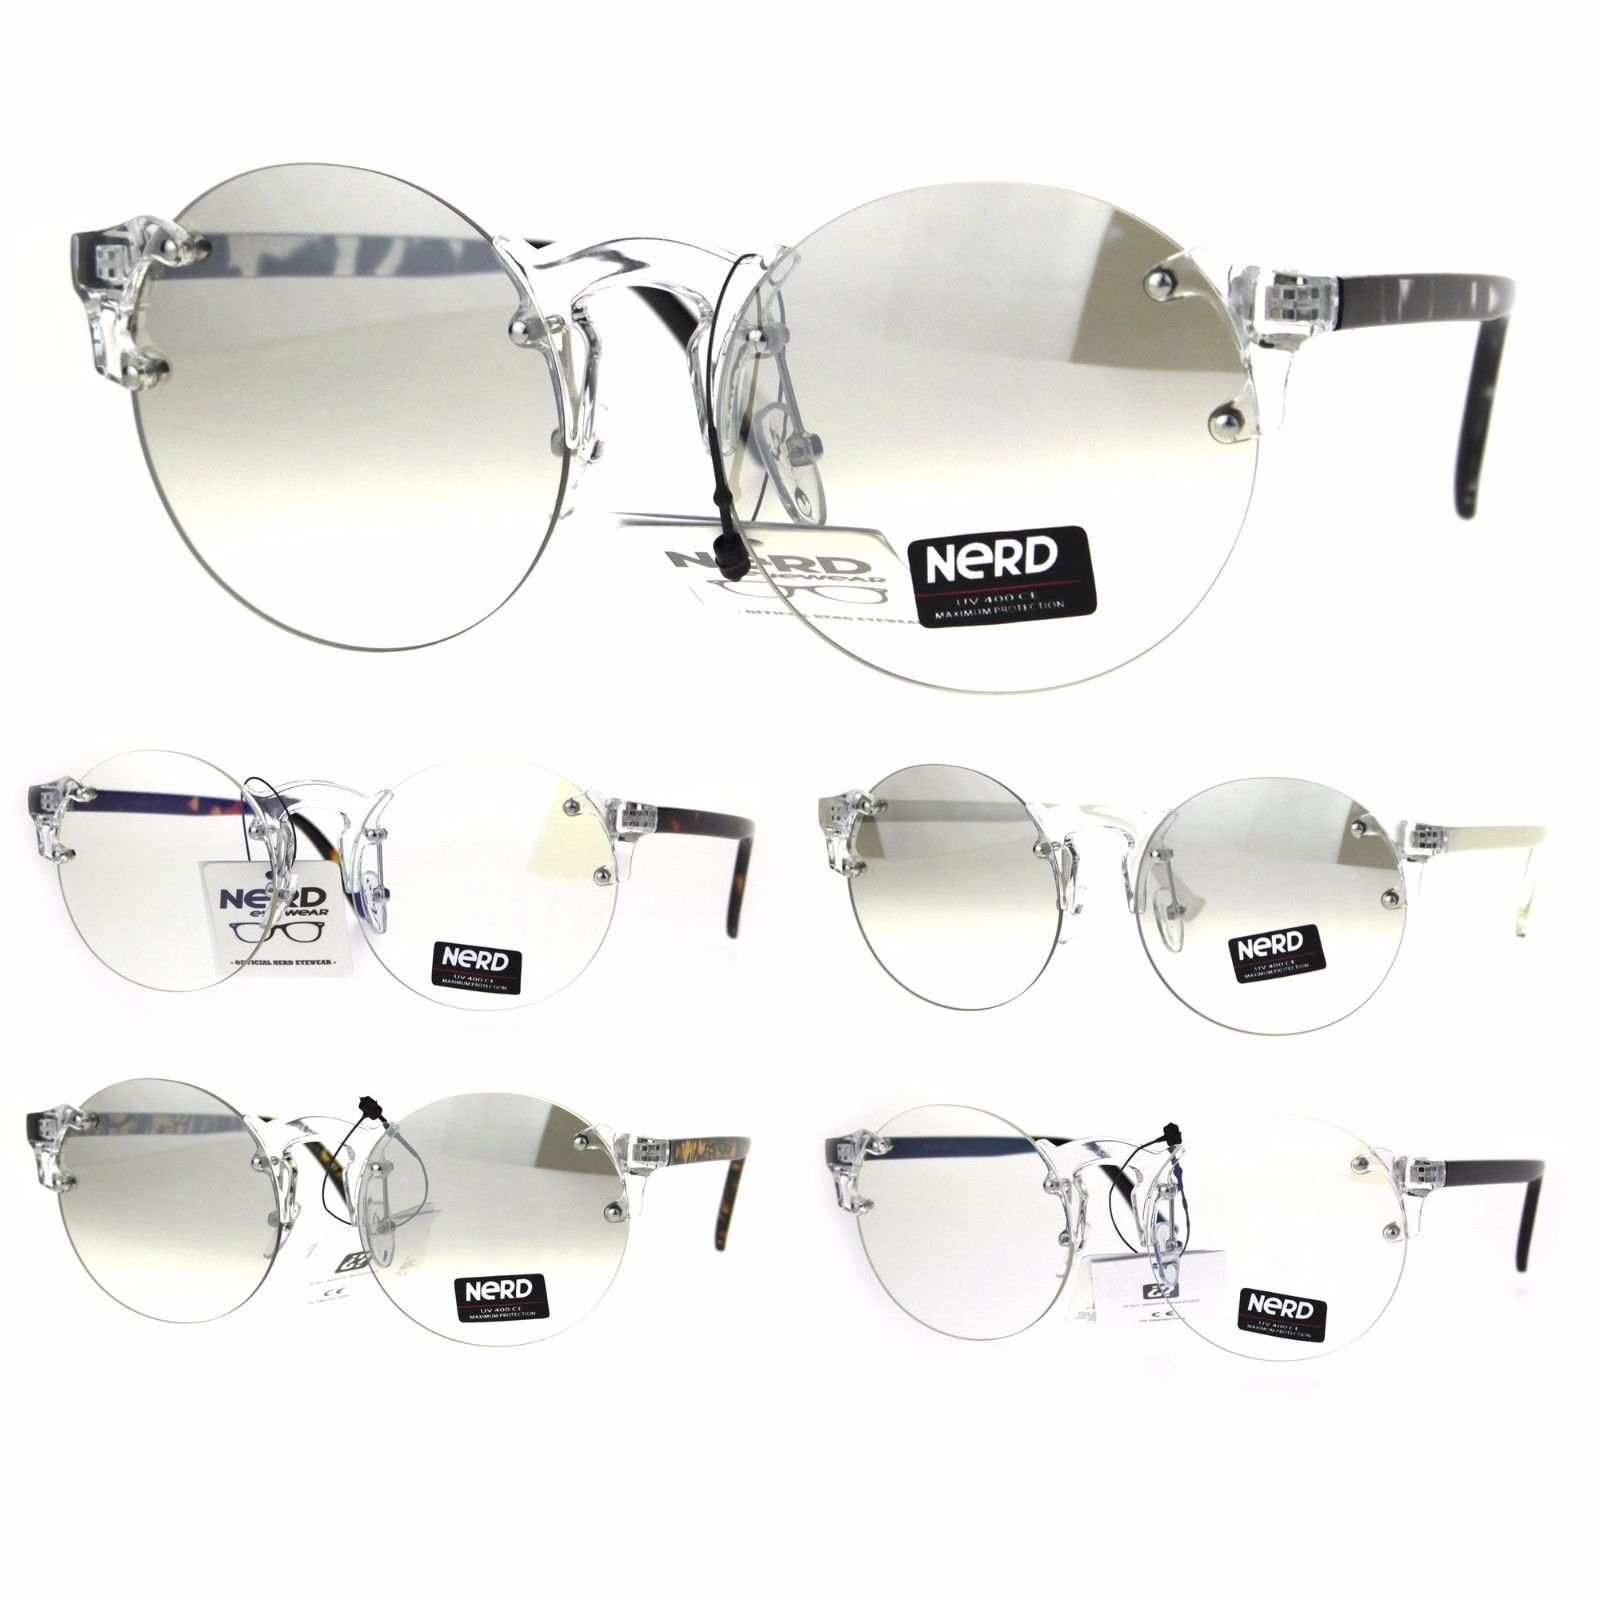 cefcb9175ec8 S l1600. S l1600. Previous. Nerd Round Rimless Hipster Clear Horn Rim  Plastic Eye Glasses. Nerd Round Rimless Hipster ...